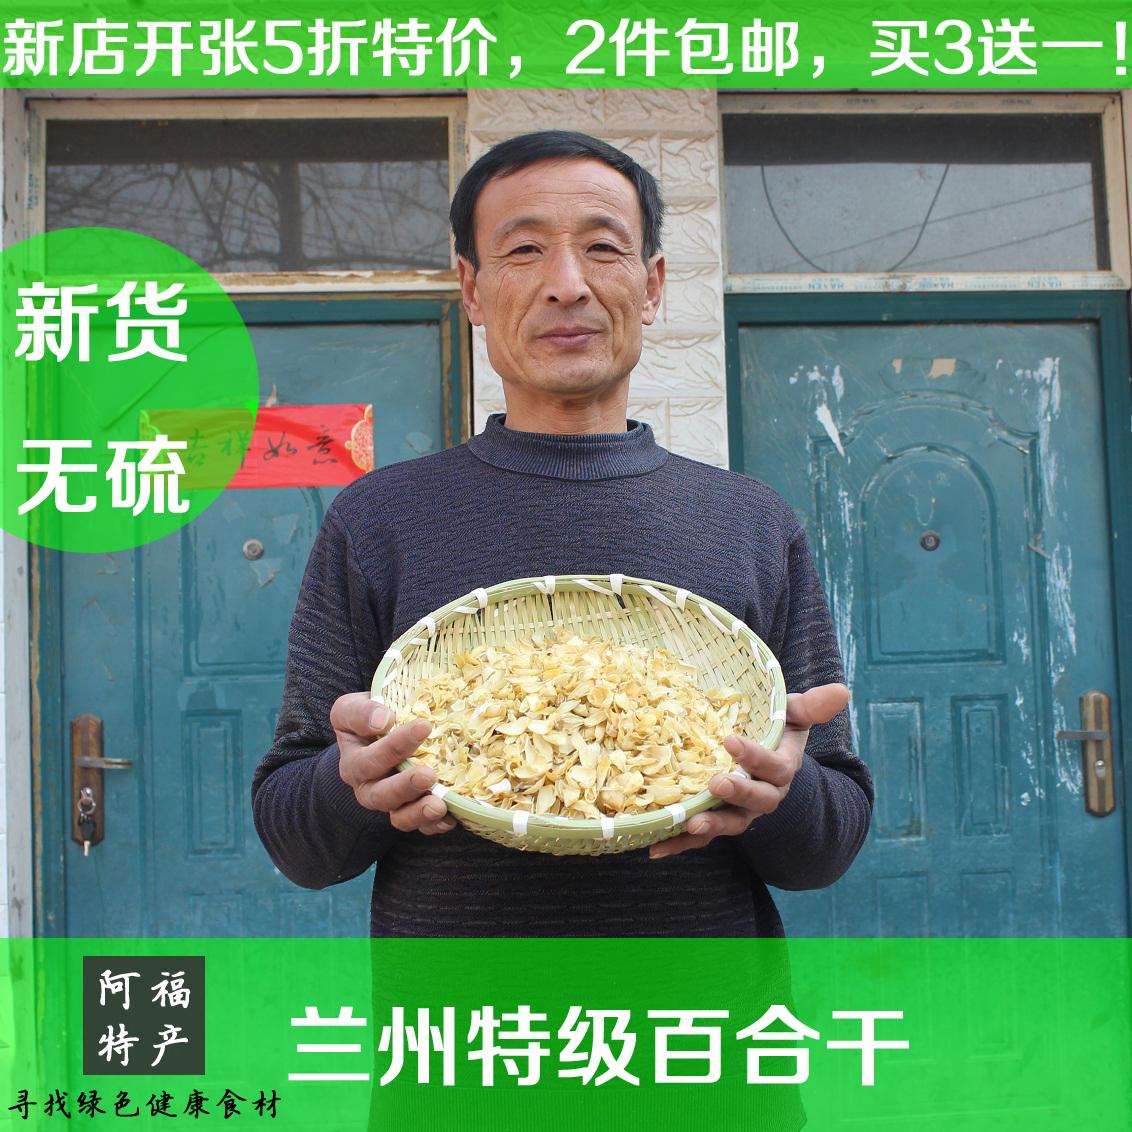 Лили Ah Fu products 250g adc80h ah 12